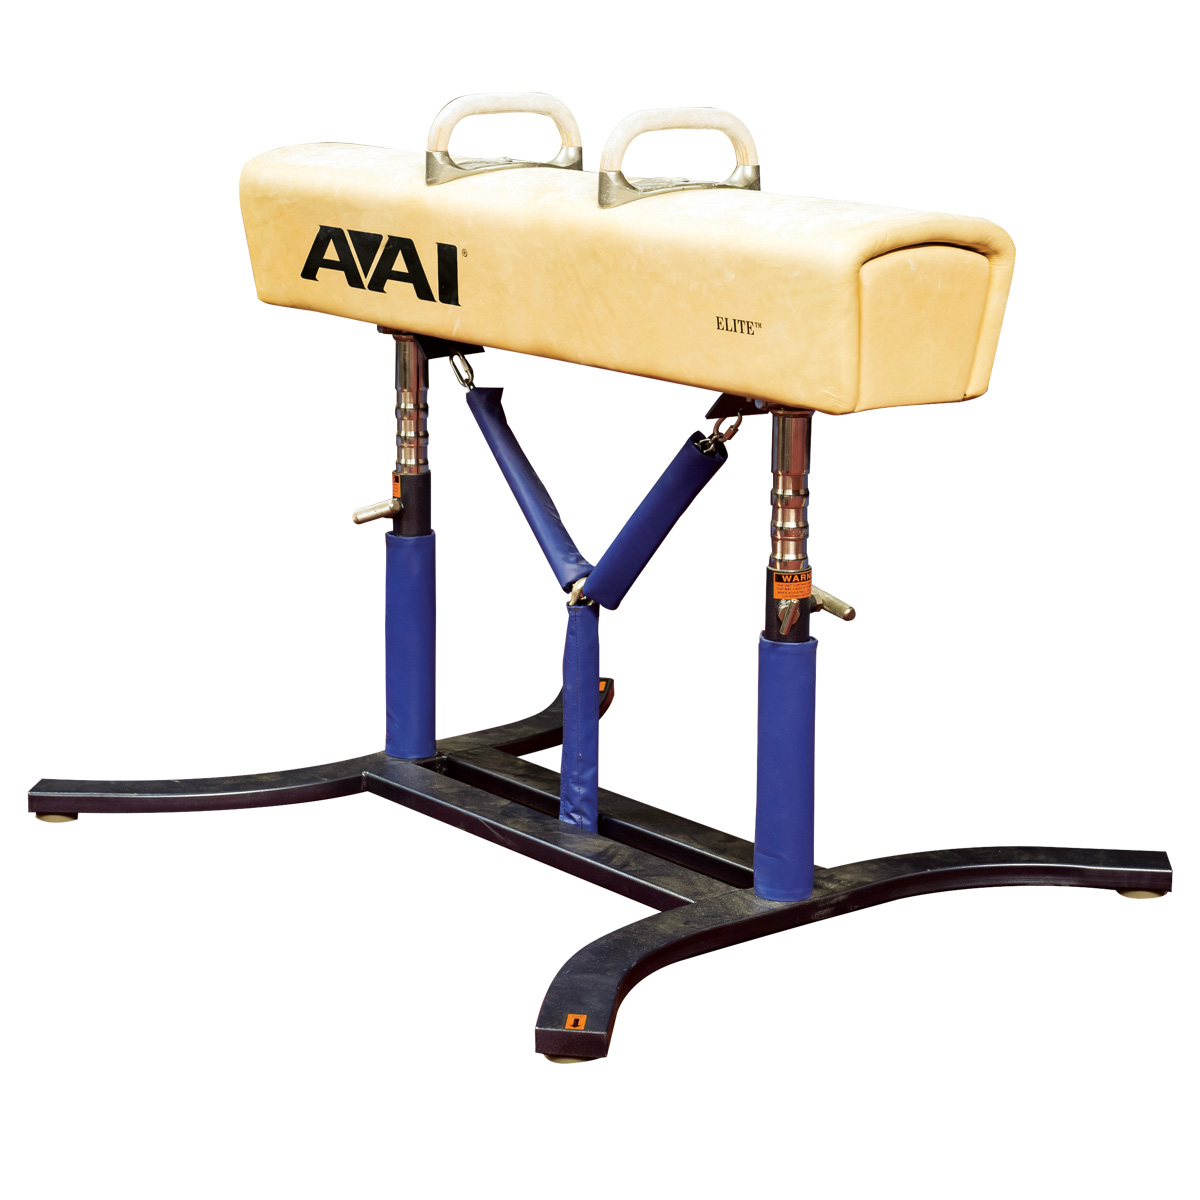 AAI Gymnastics Equipment